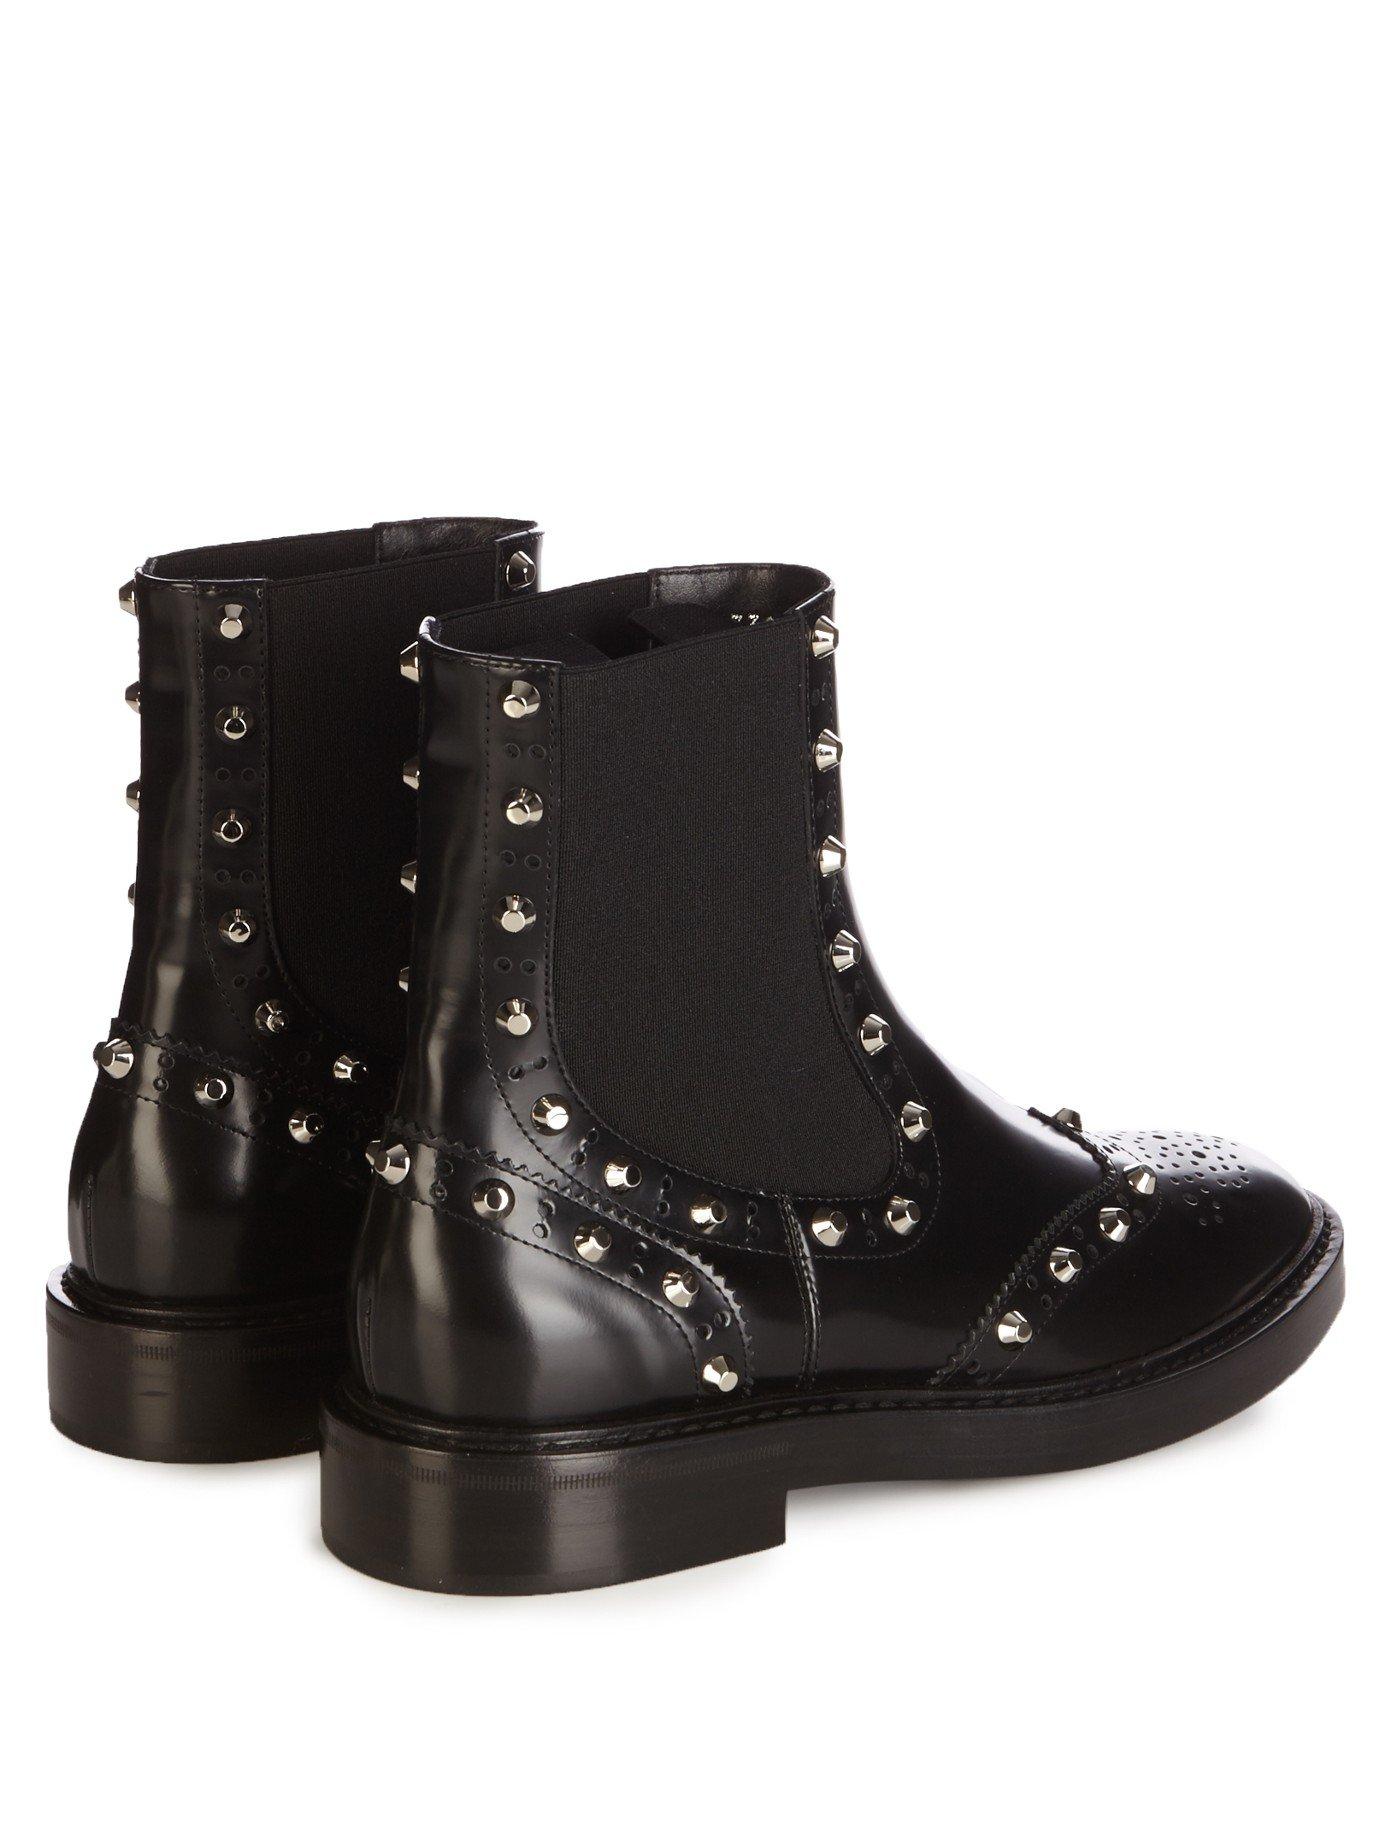 balenciaga studded chelsea brogue boots in black lyst. Black Bedroom Furniture Sets. Home Design Ideas